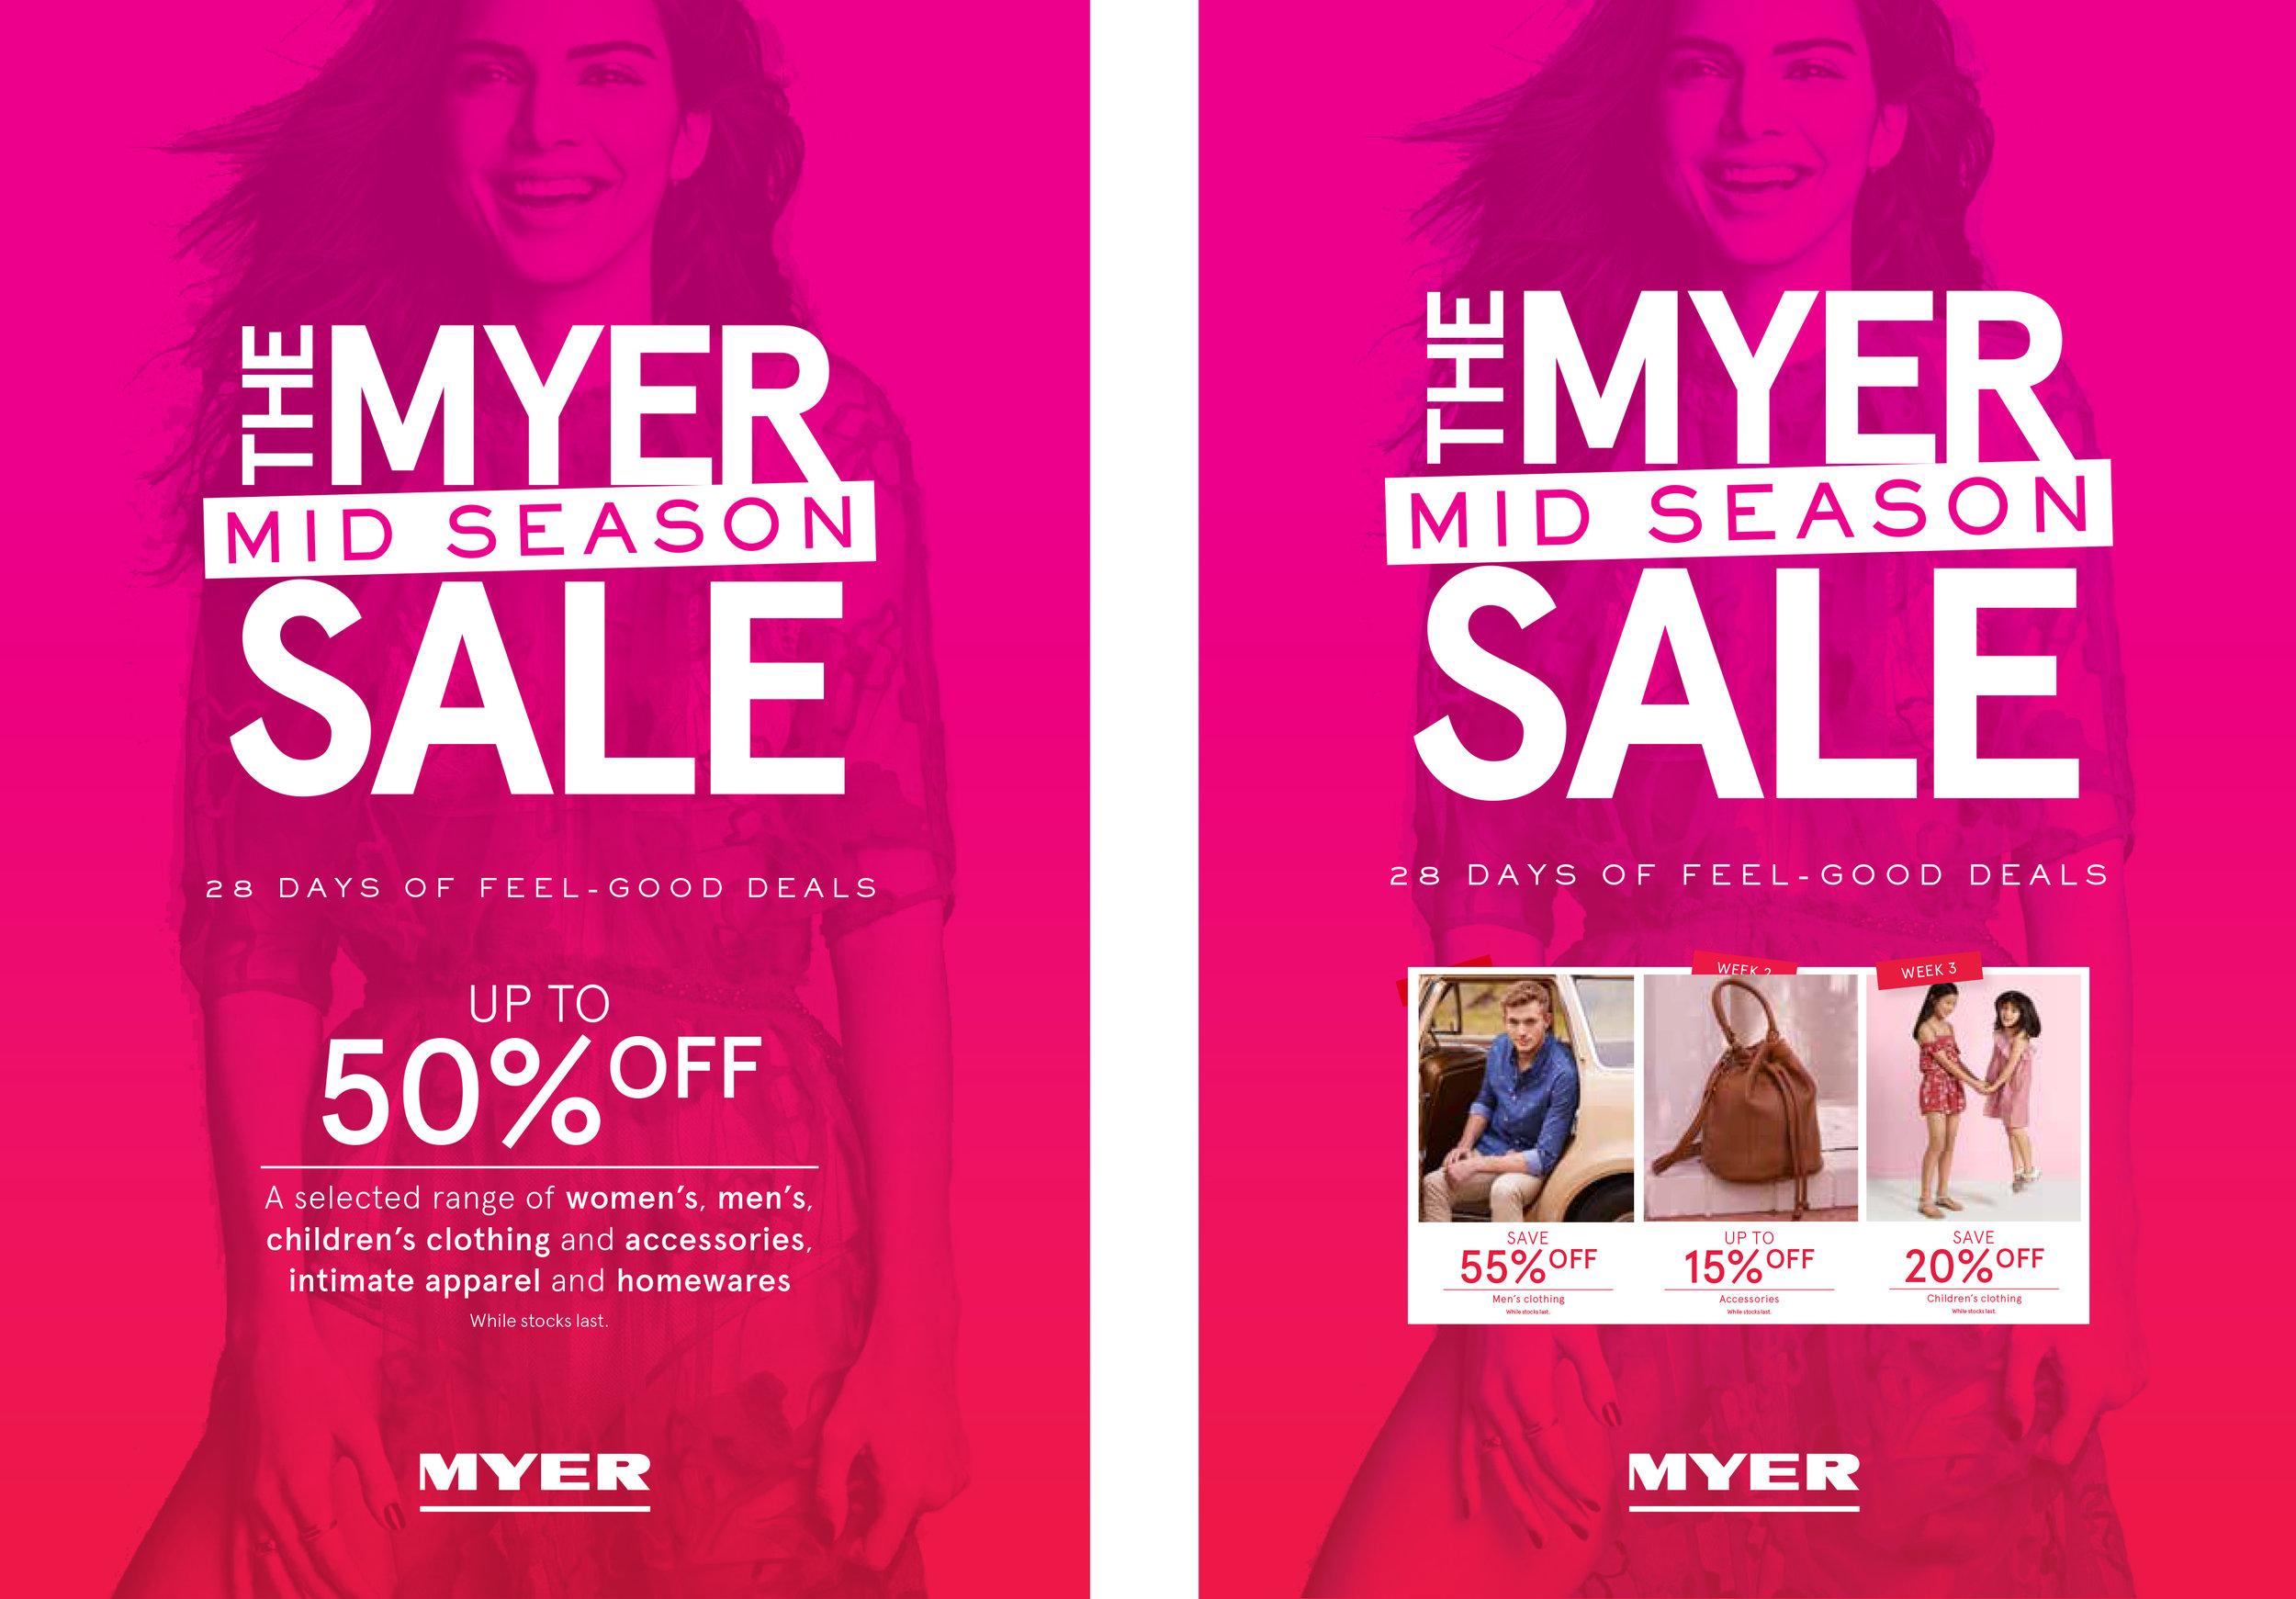 MYER3225-Mid-Season-Sale-Presentation_v7-9A.jpg